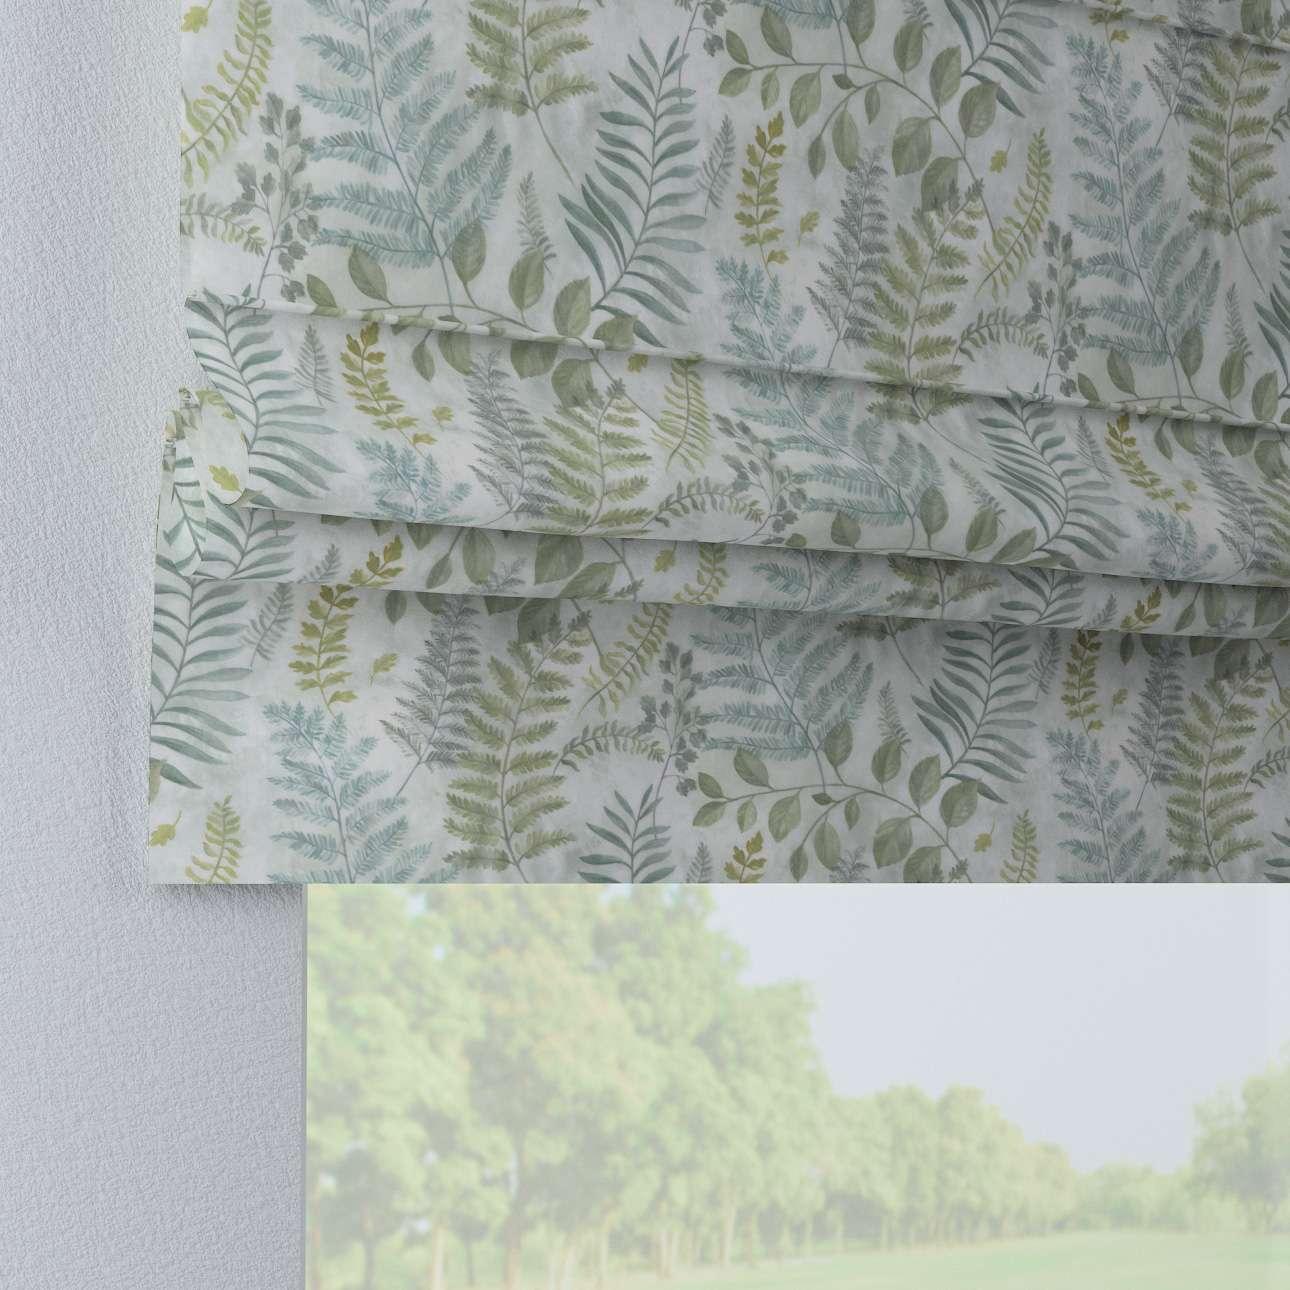 Roleta rzymska Padva w kolekcji Pastel Forest, tkanina: 142-46